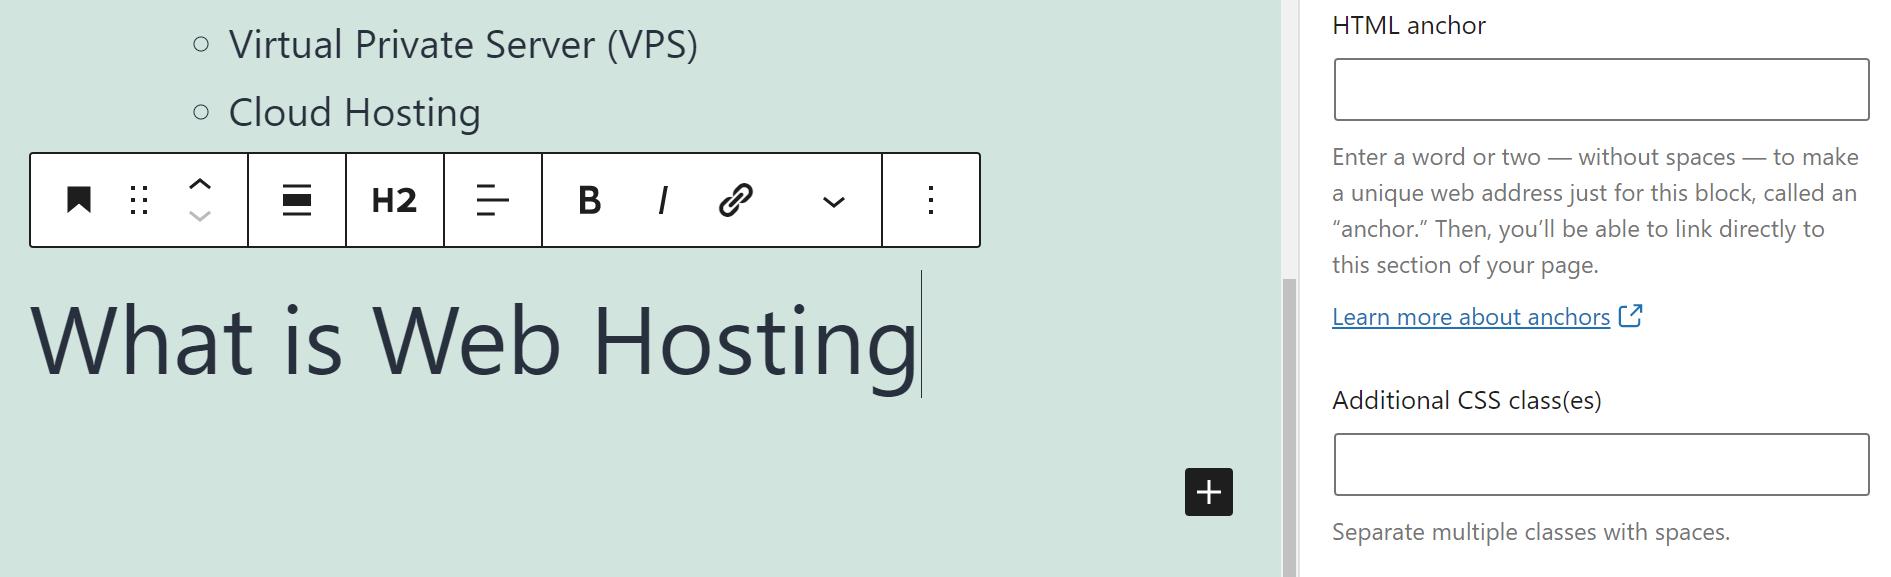 Adding an HTML anchor for a block